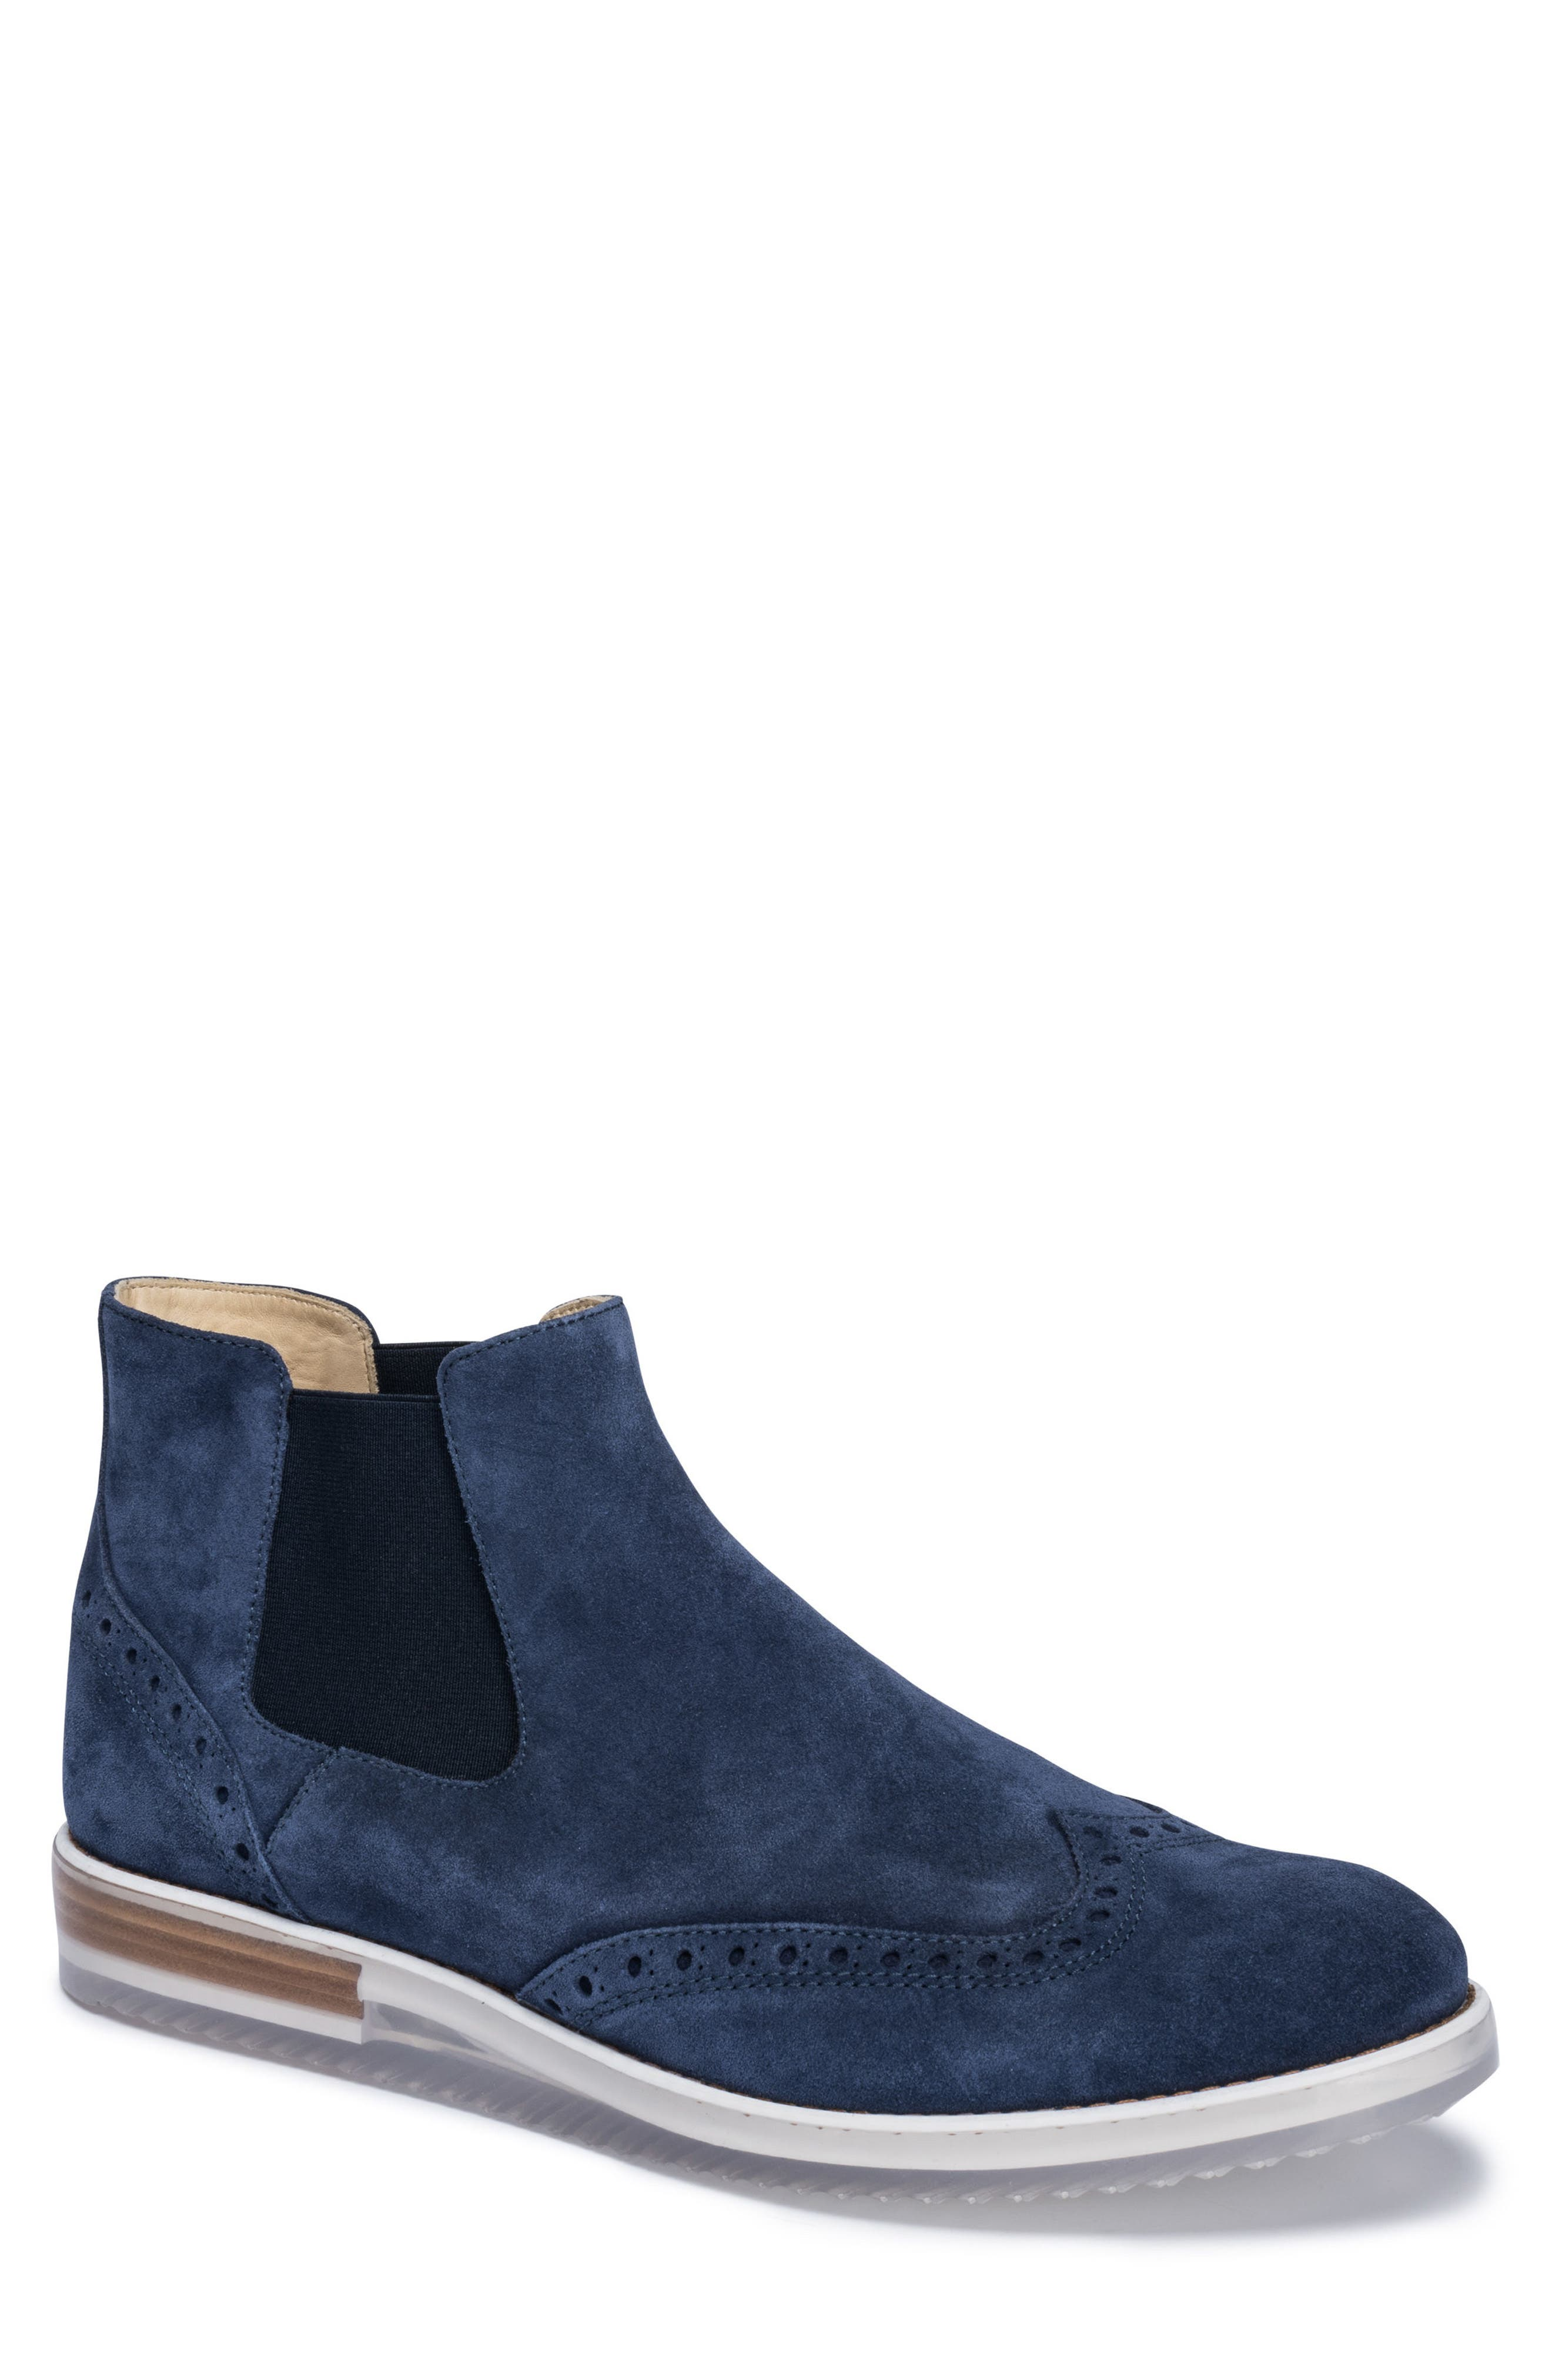 Brescia Mid Chelsea Wingtip Sneaker Boot,                             Main thumbnail 1, color,                             429